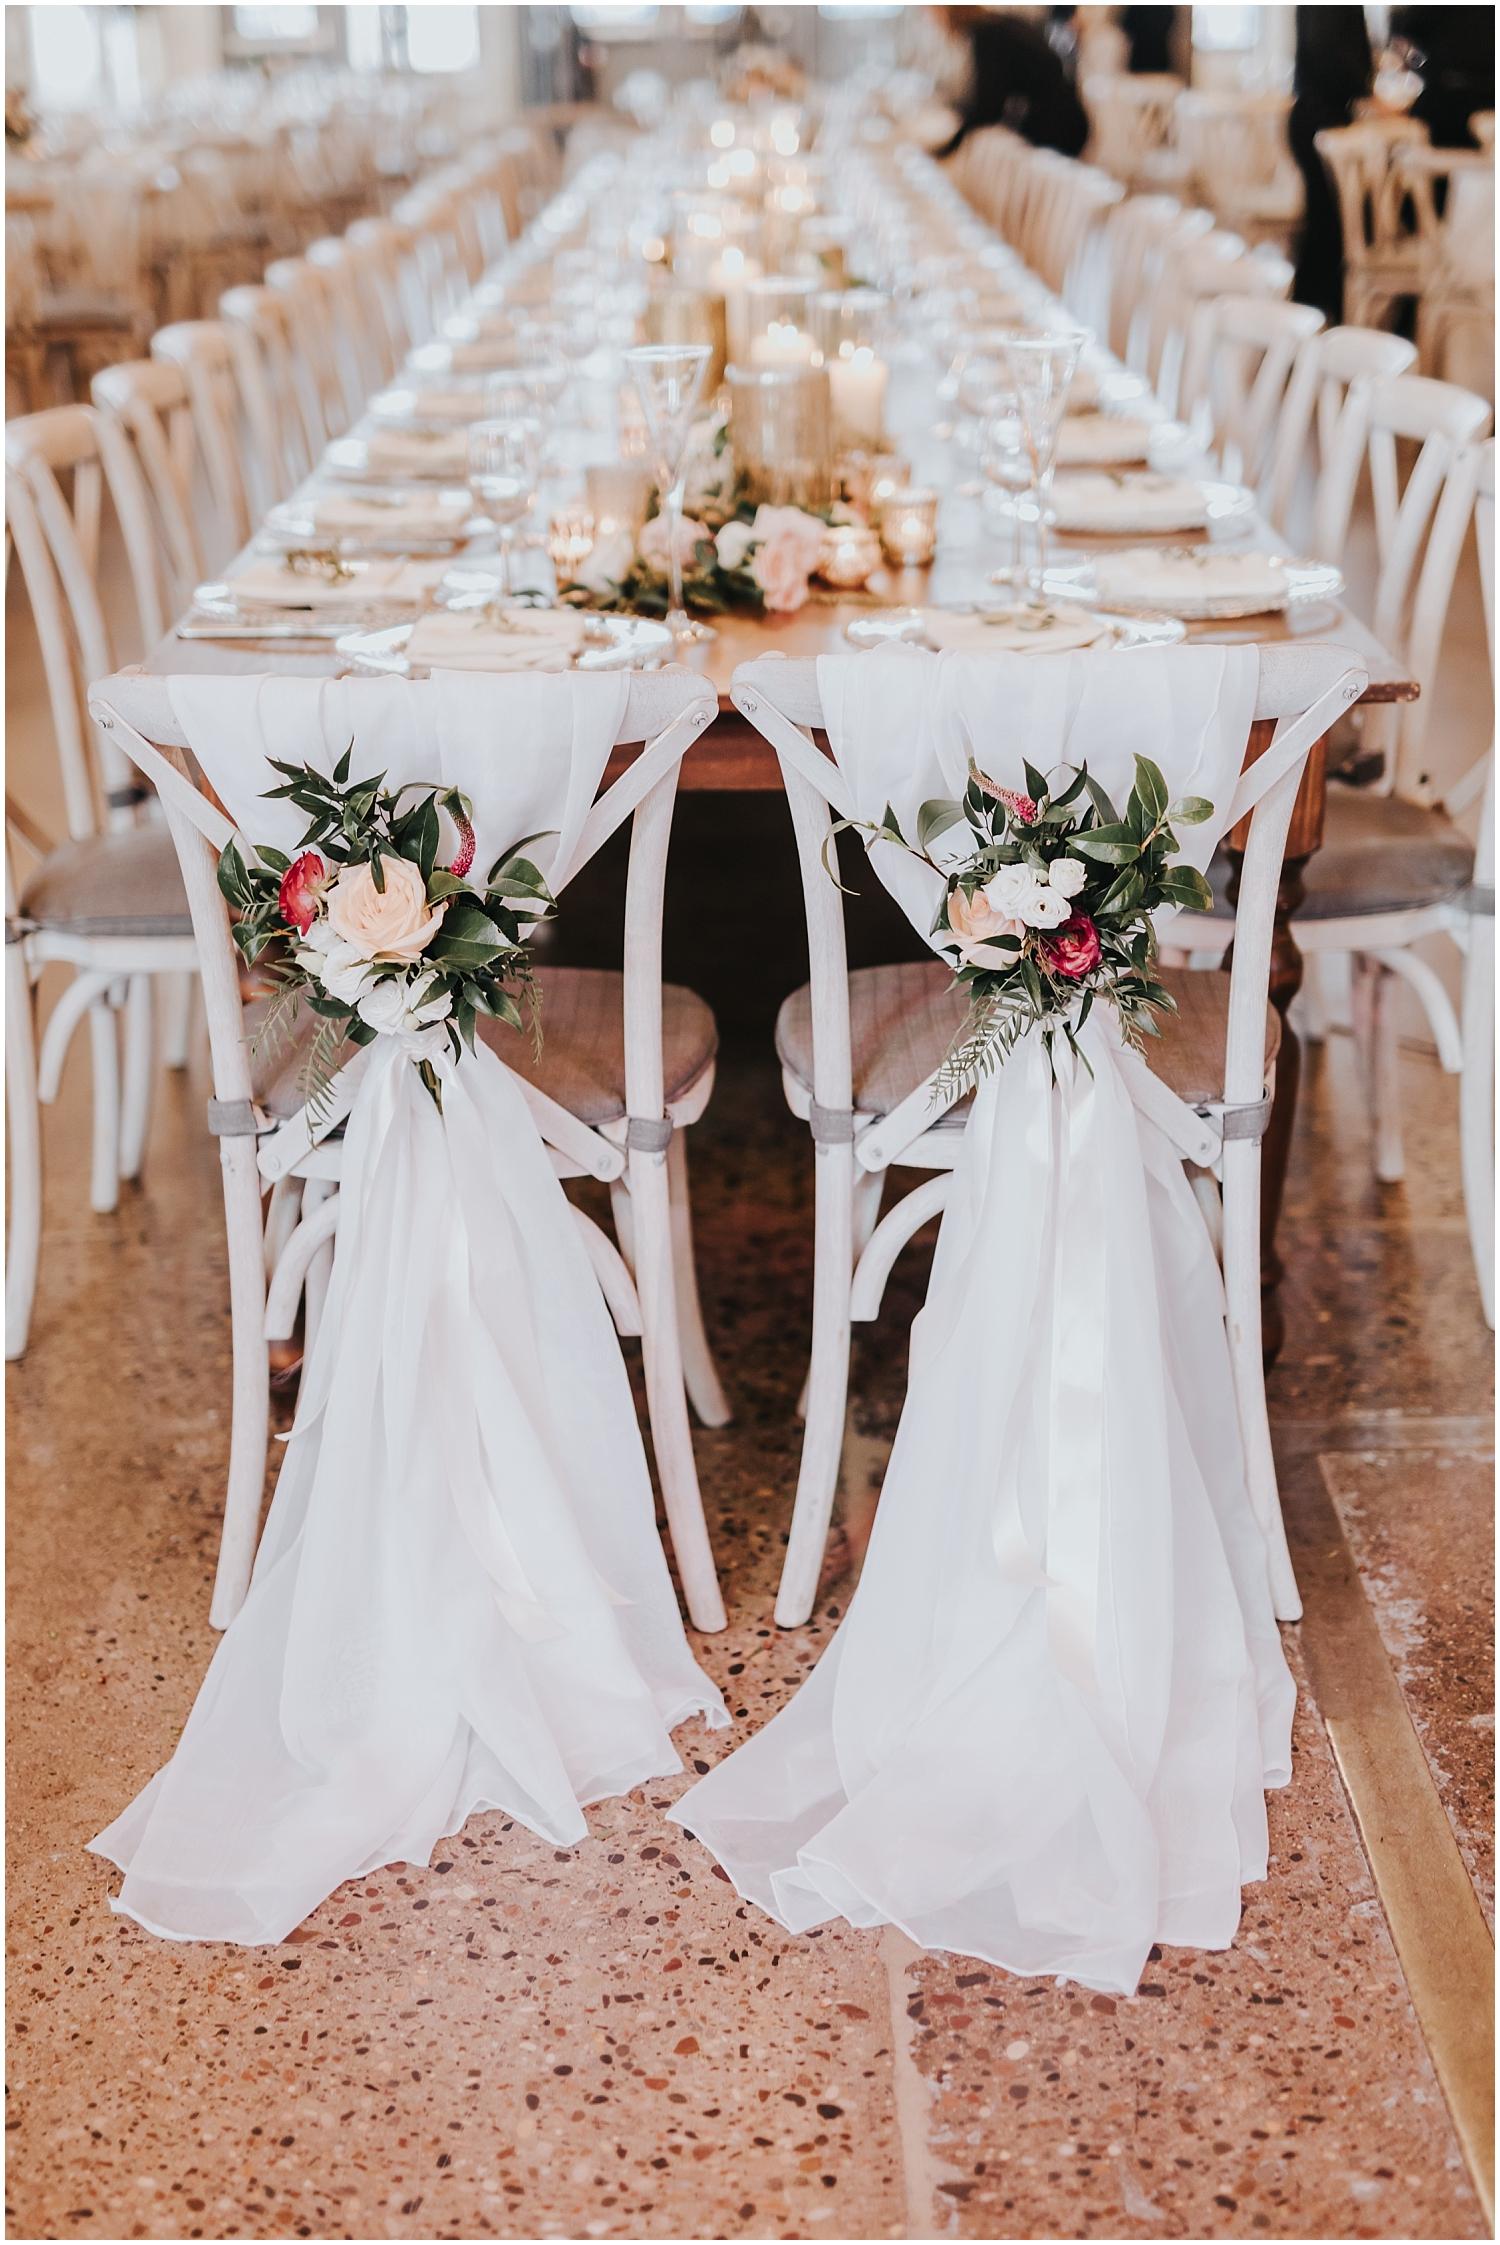 bride and groom's wedding chair decor